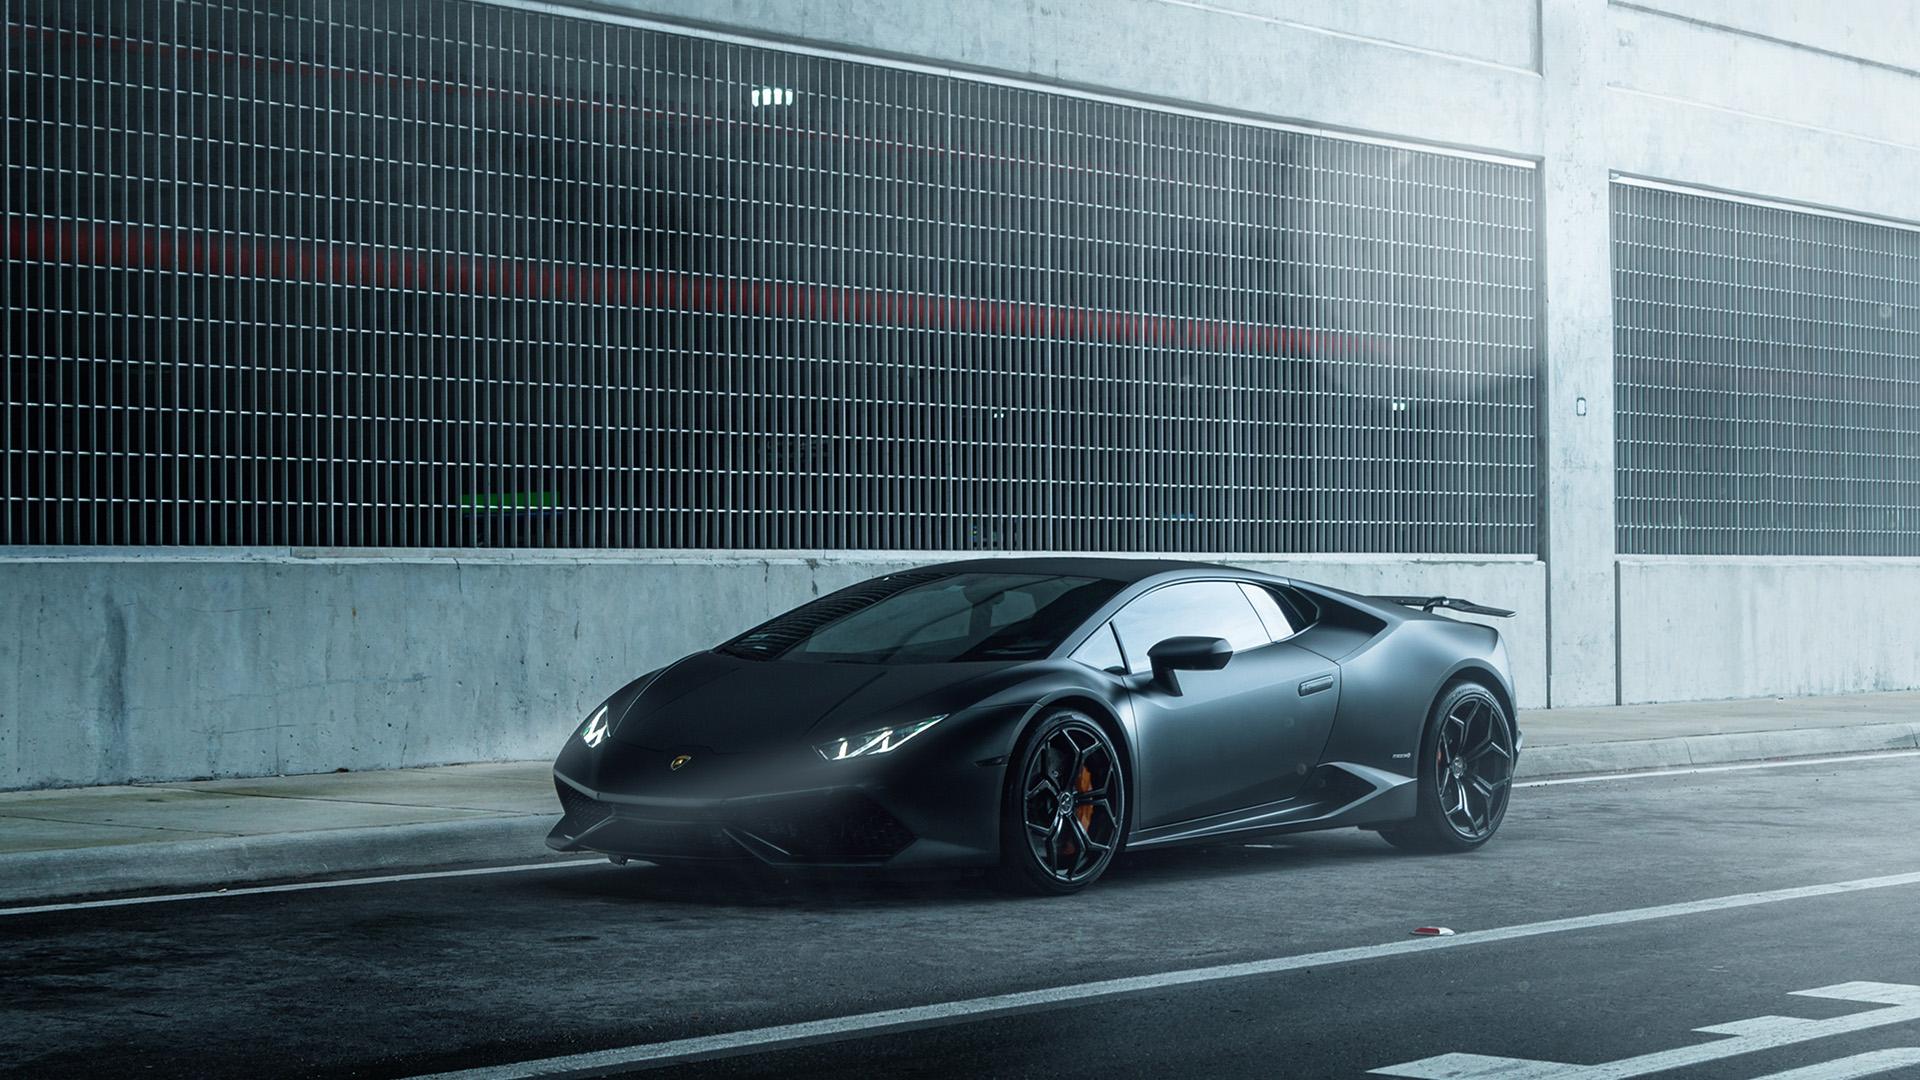 Fall Desktop Wallpaper Widescreen Free Aq49 Lamborghini Huracan Vellano Matte Black Car Wallpaper